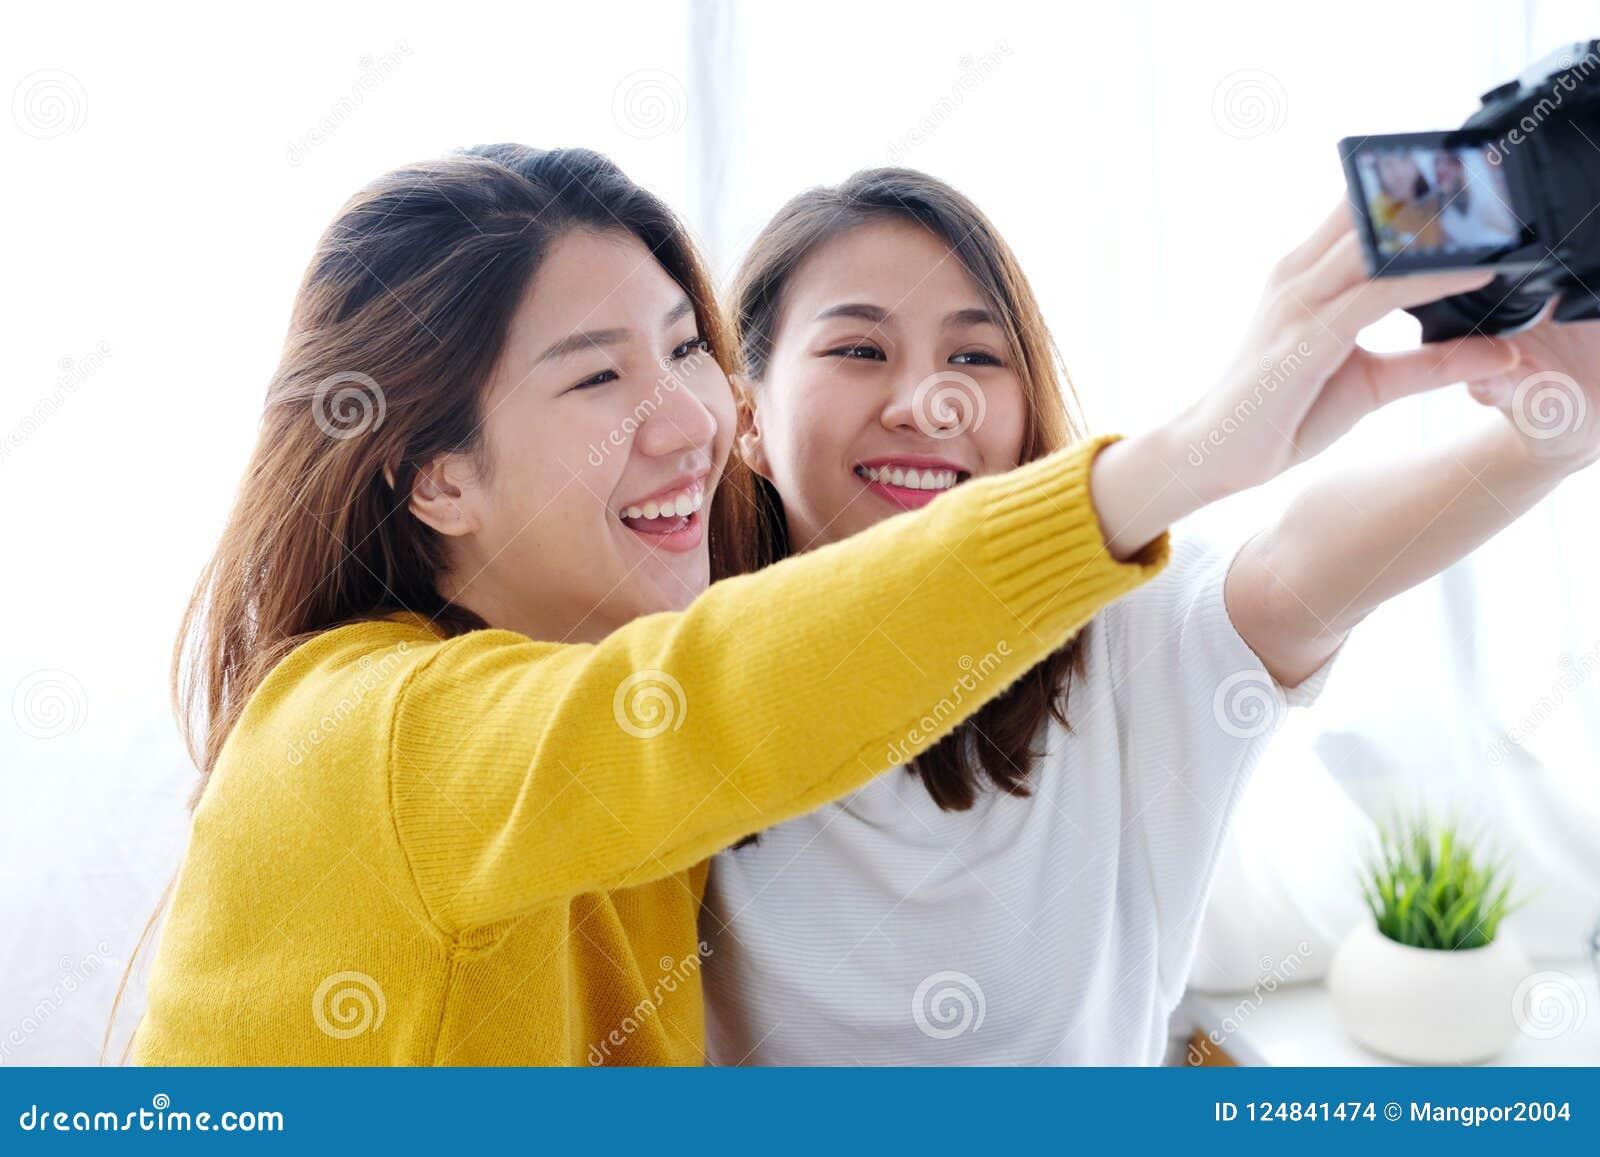 Young Cute Asian Woman Lesbian Couple Using Camera To -7098